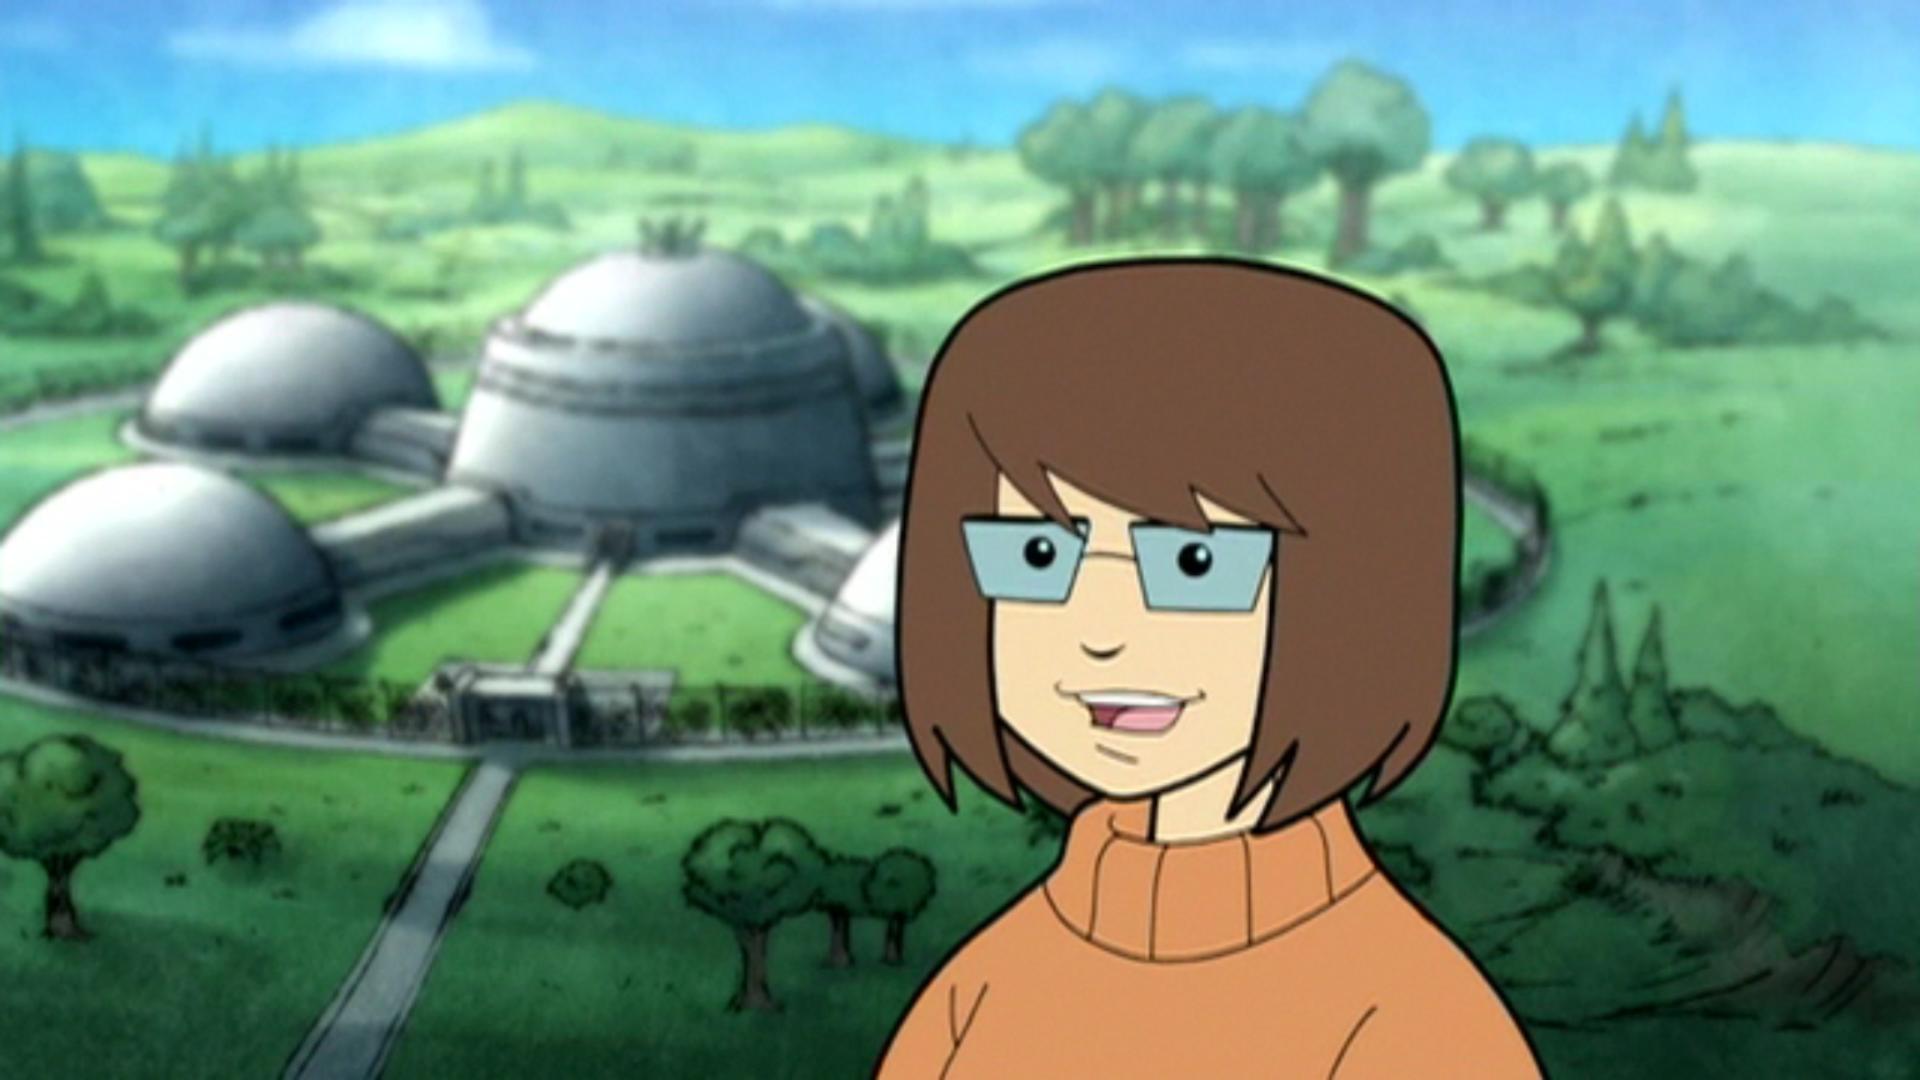 Velma Dinkley (Shaggy & Scooby-Doo Get A Clue